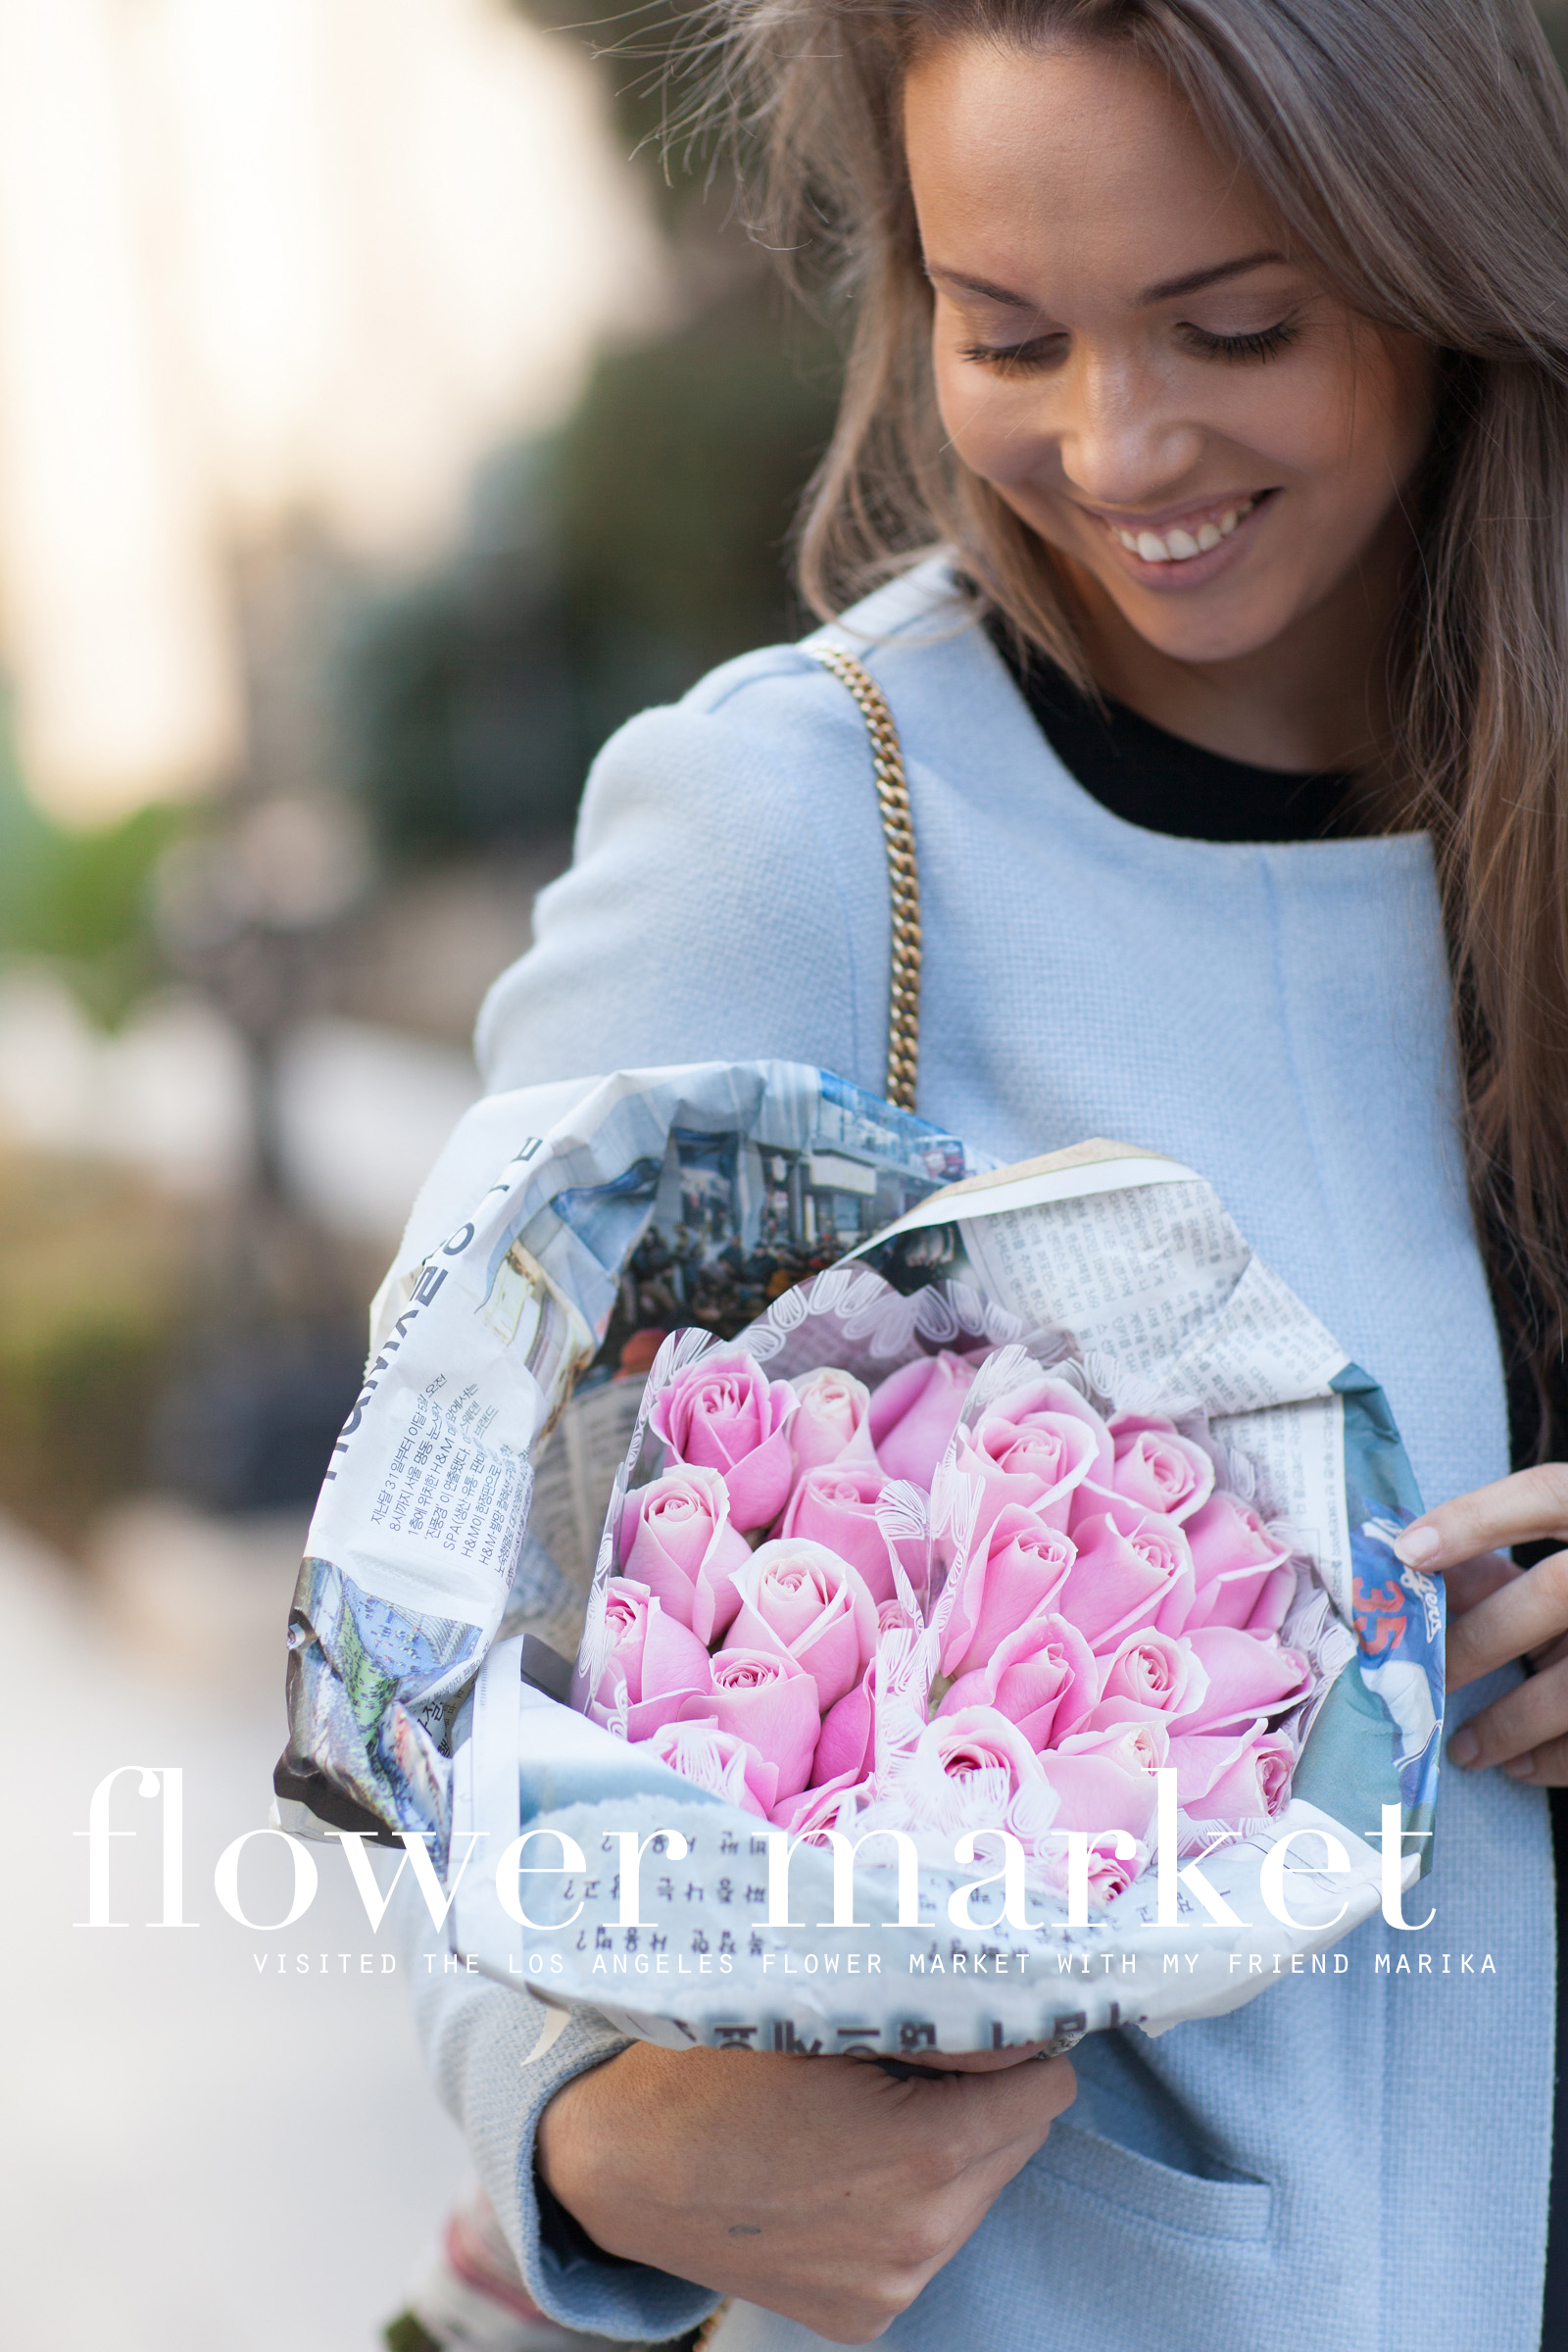 la flower market asu-4597 text